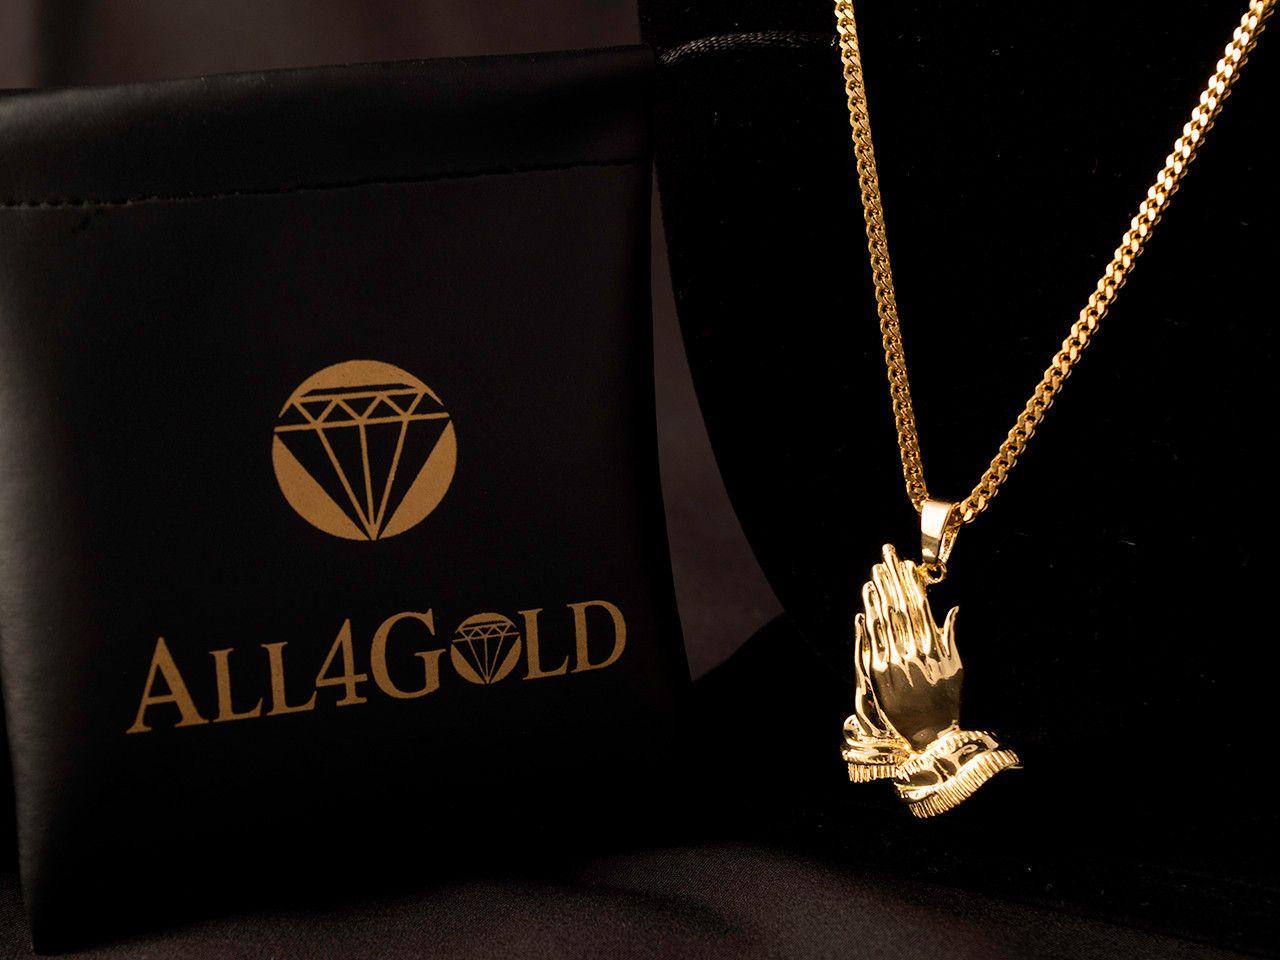 Praying hands charm necklace 18k gold praying hands pendant franco necklace aloadofball Choice Image